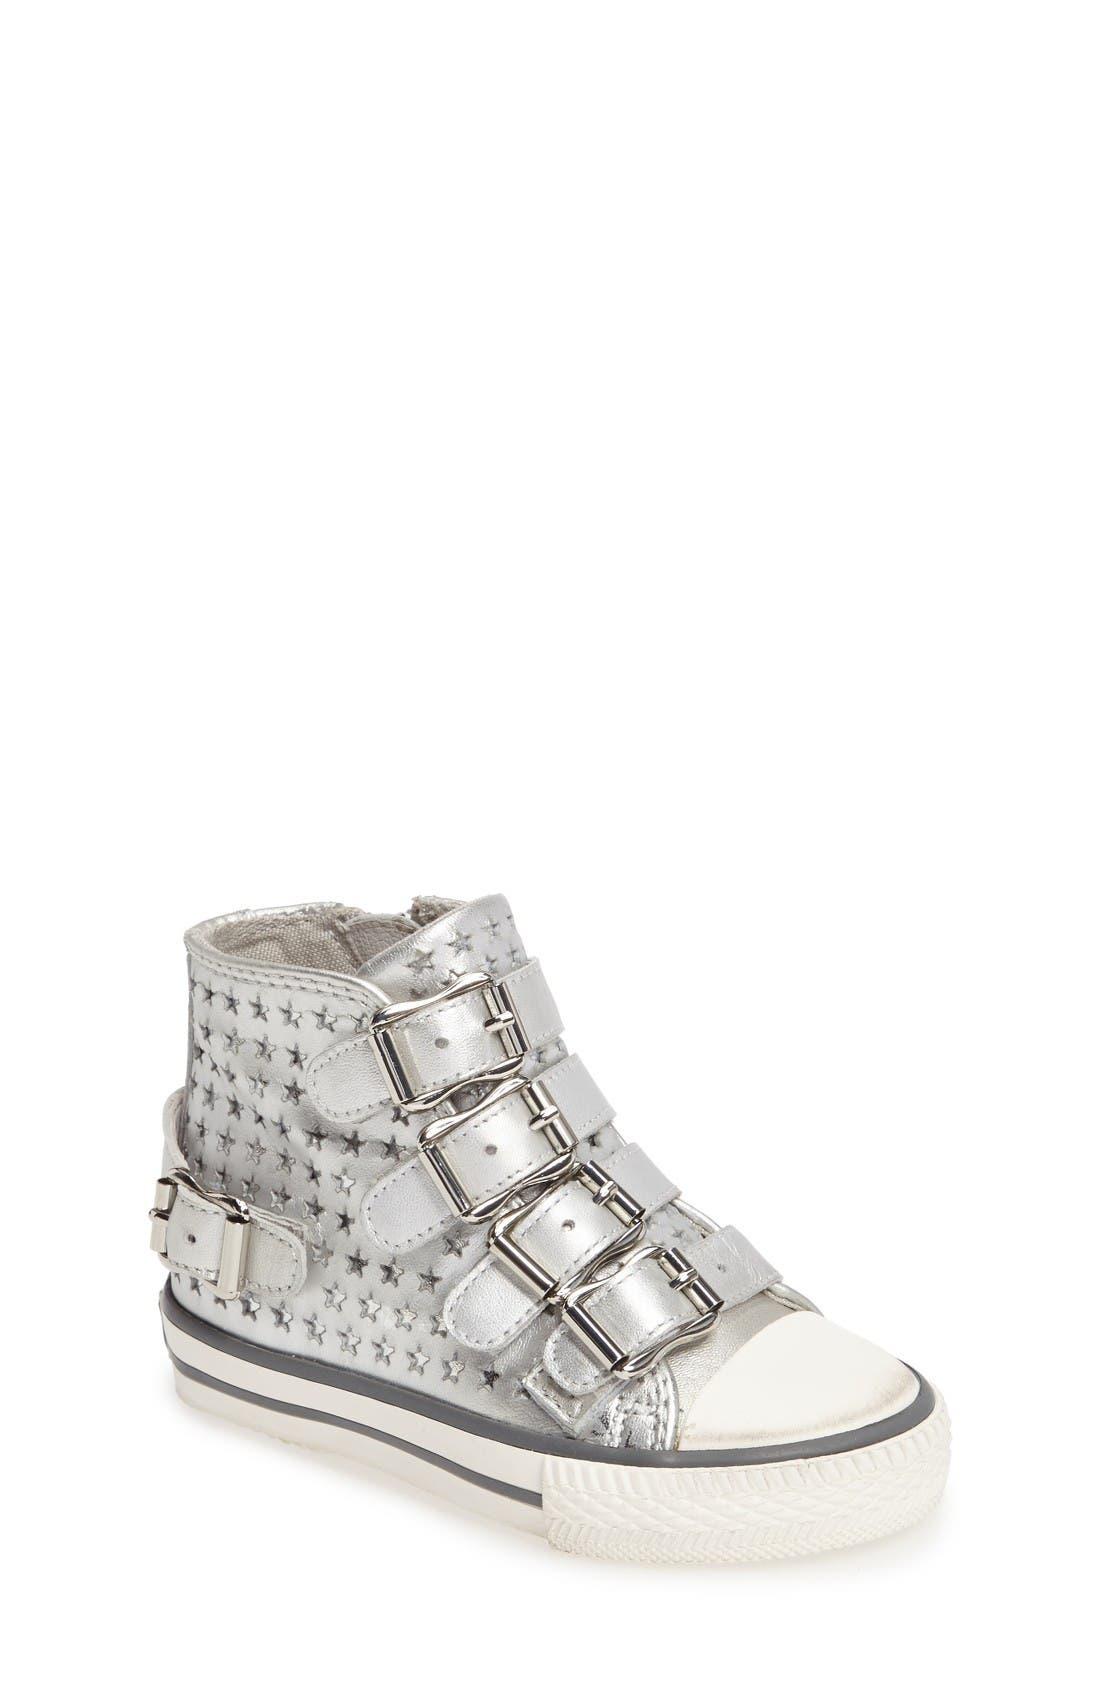 Ash Vava Starboss Buckle Strap High Top Sneaker (Walker, Toddler, Little Kid & Big Kid)